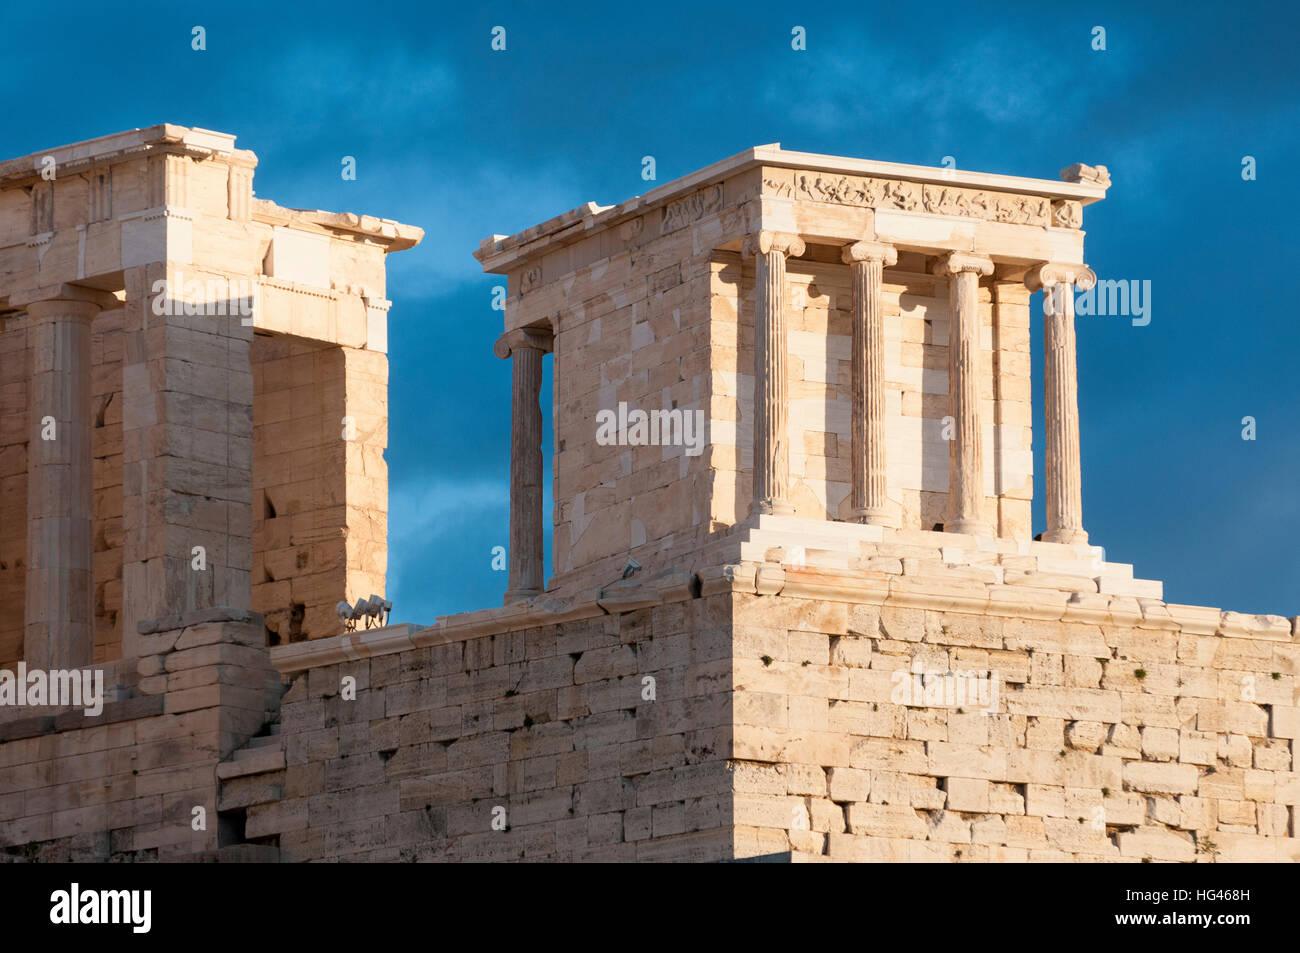 temple of athena nike, propylaea of acropolis - Stock Image